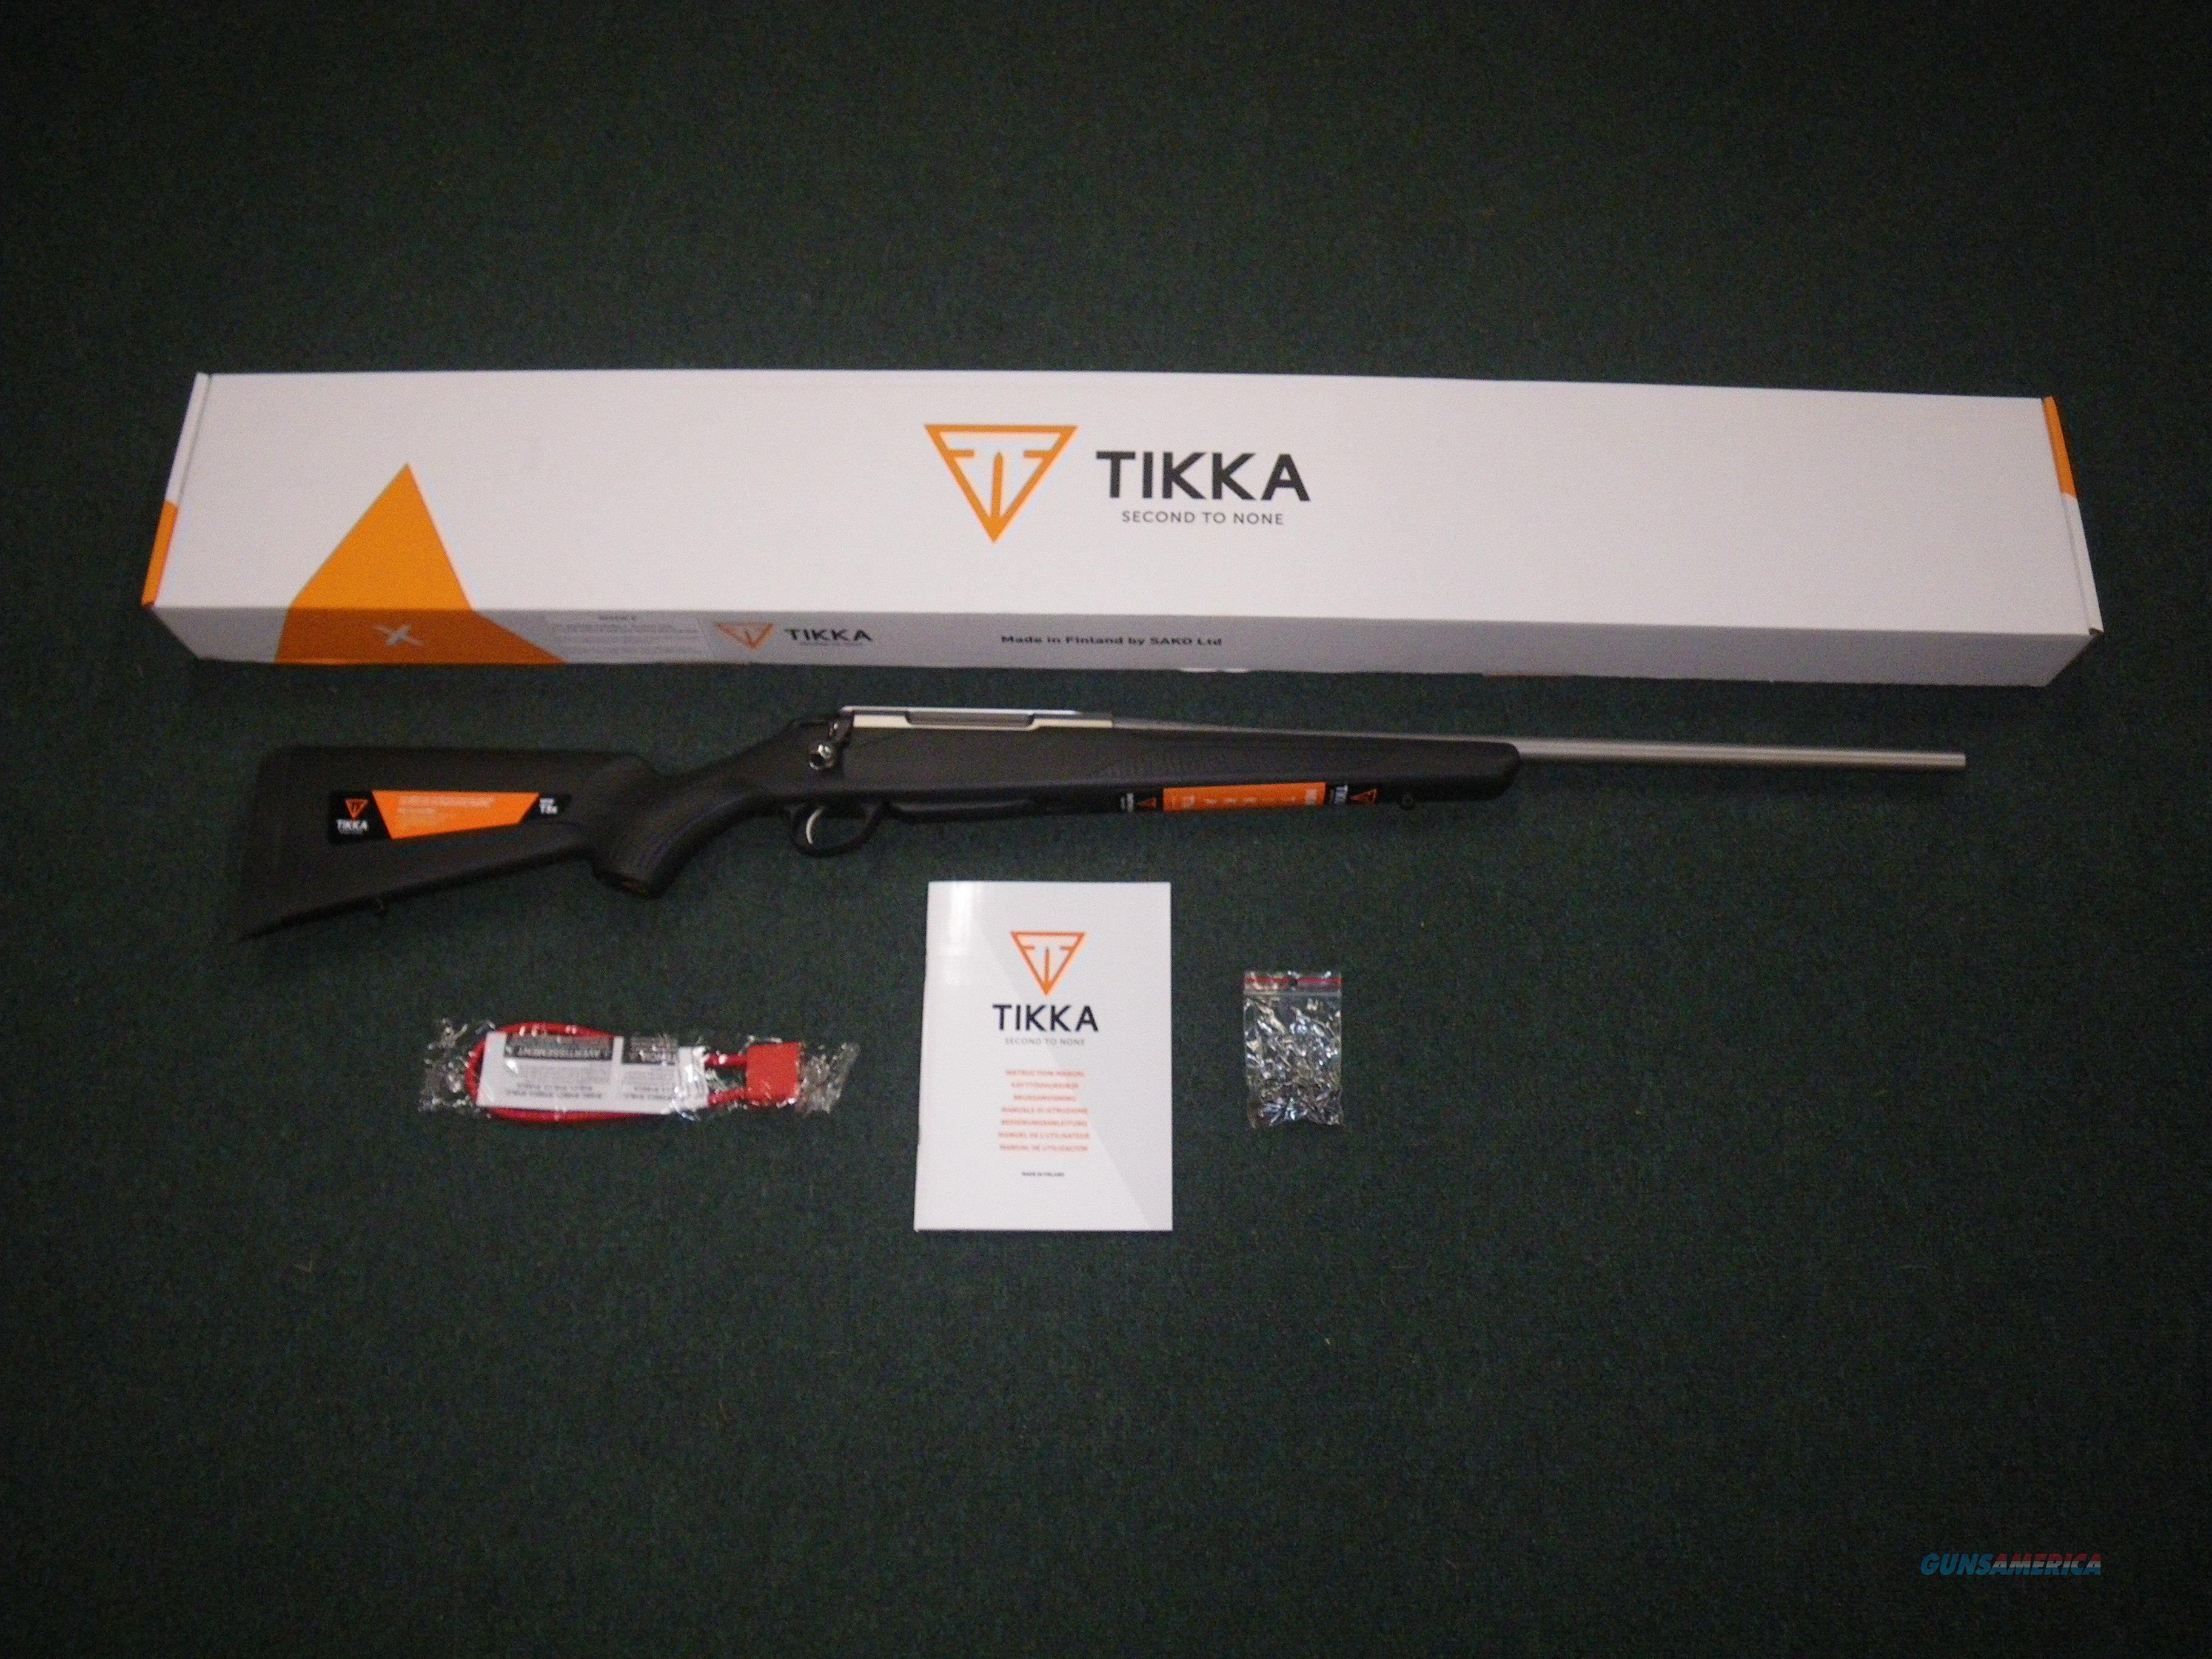 "Tikka T3x Lite Stainless Syn 25-06 Rem 22.4"" NEW JRTXB317  Guns > Rifles > Tikka Rifles > T3"